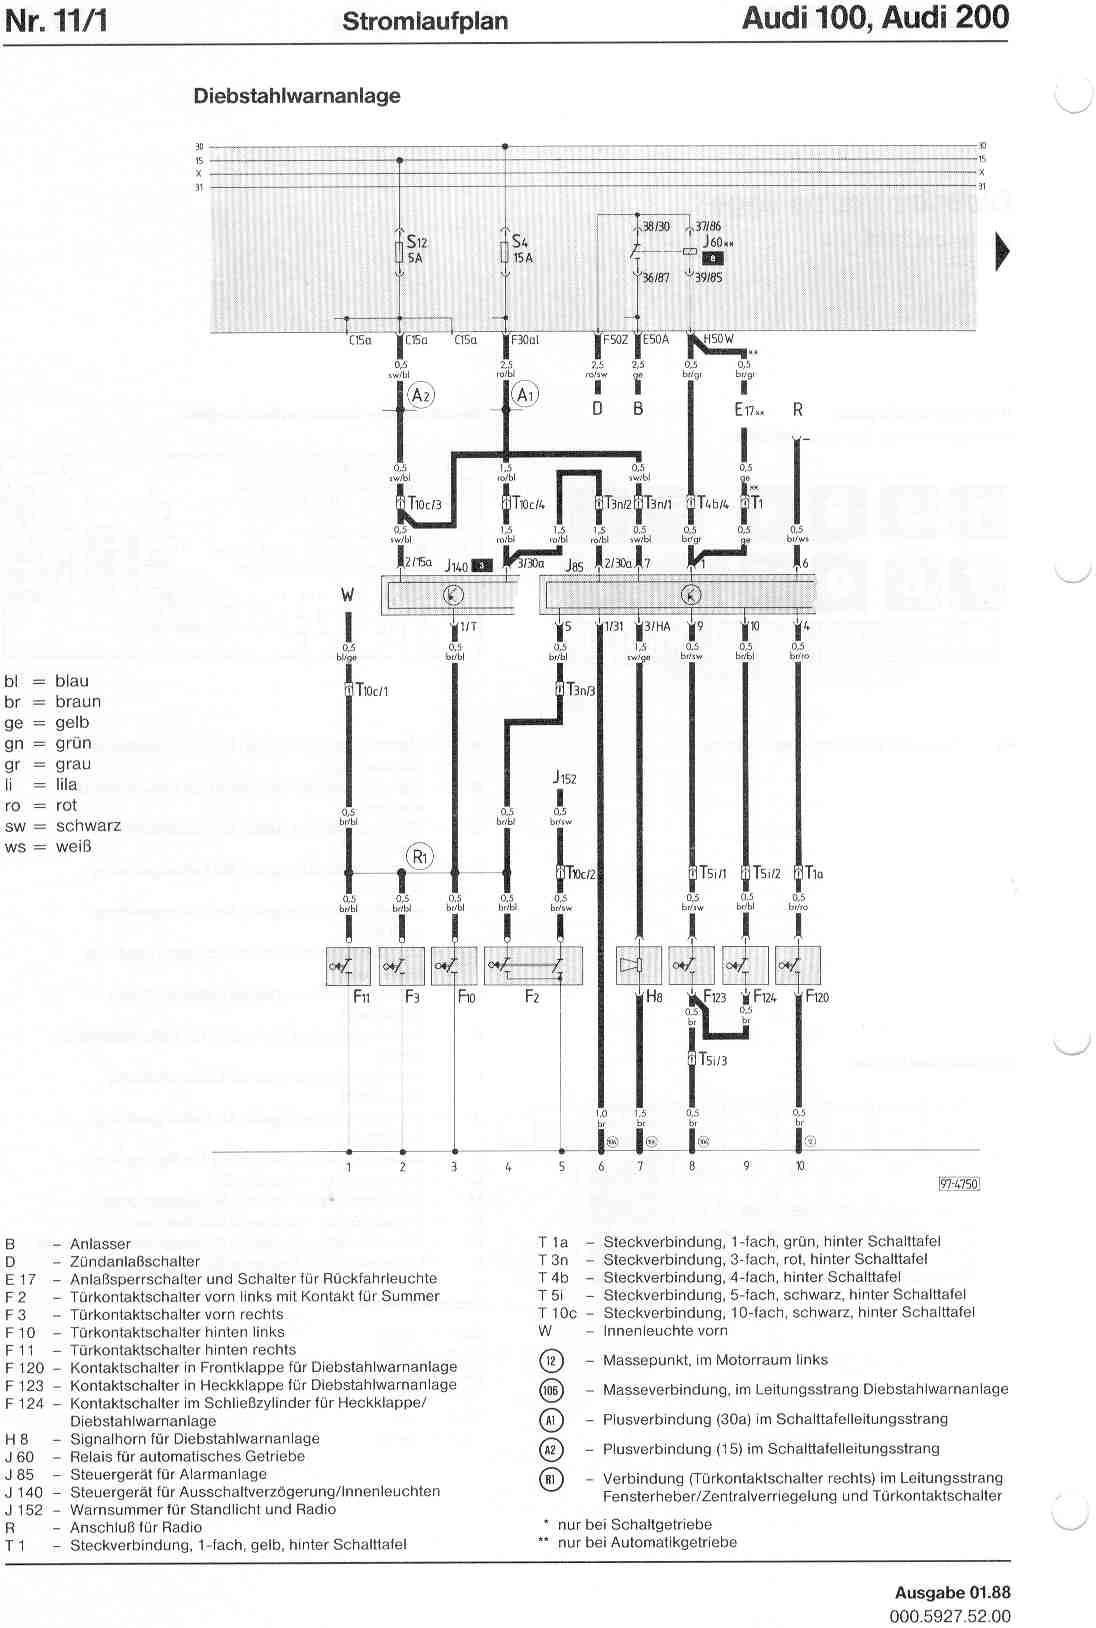 Audi C4 Wiring Diagram -2005 Grand Cherokee Wiring Diagram   Begeboy Wiring  Diagram Source   Audi C4 Wiring Diagram      Begeboy Wiring Diagram Source